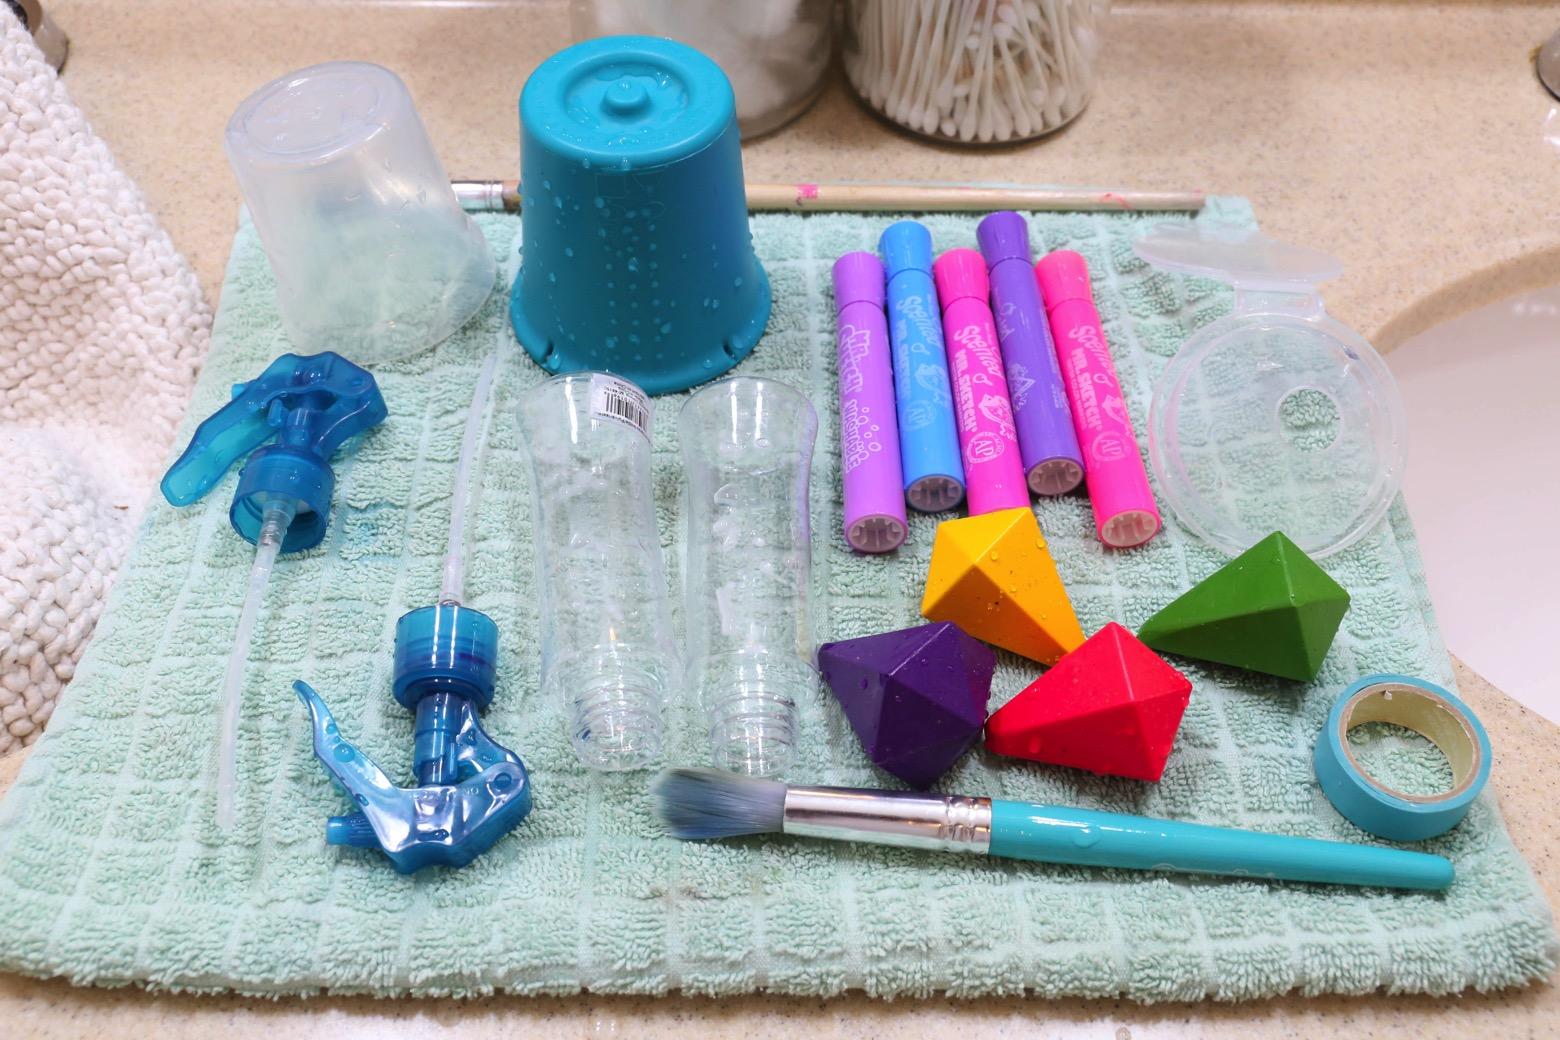 Bath Tub Art Studio Clean Up